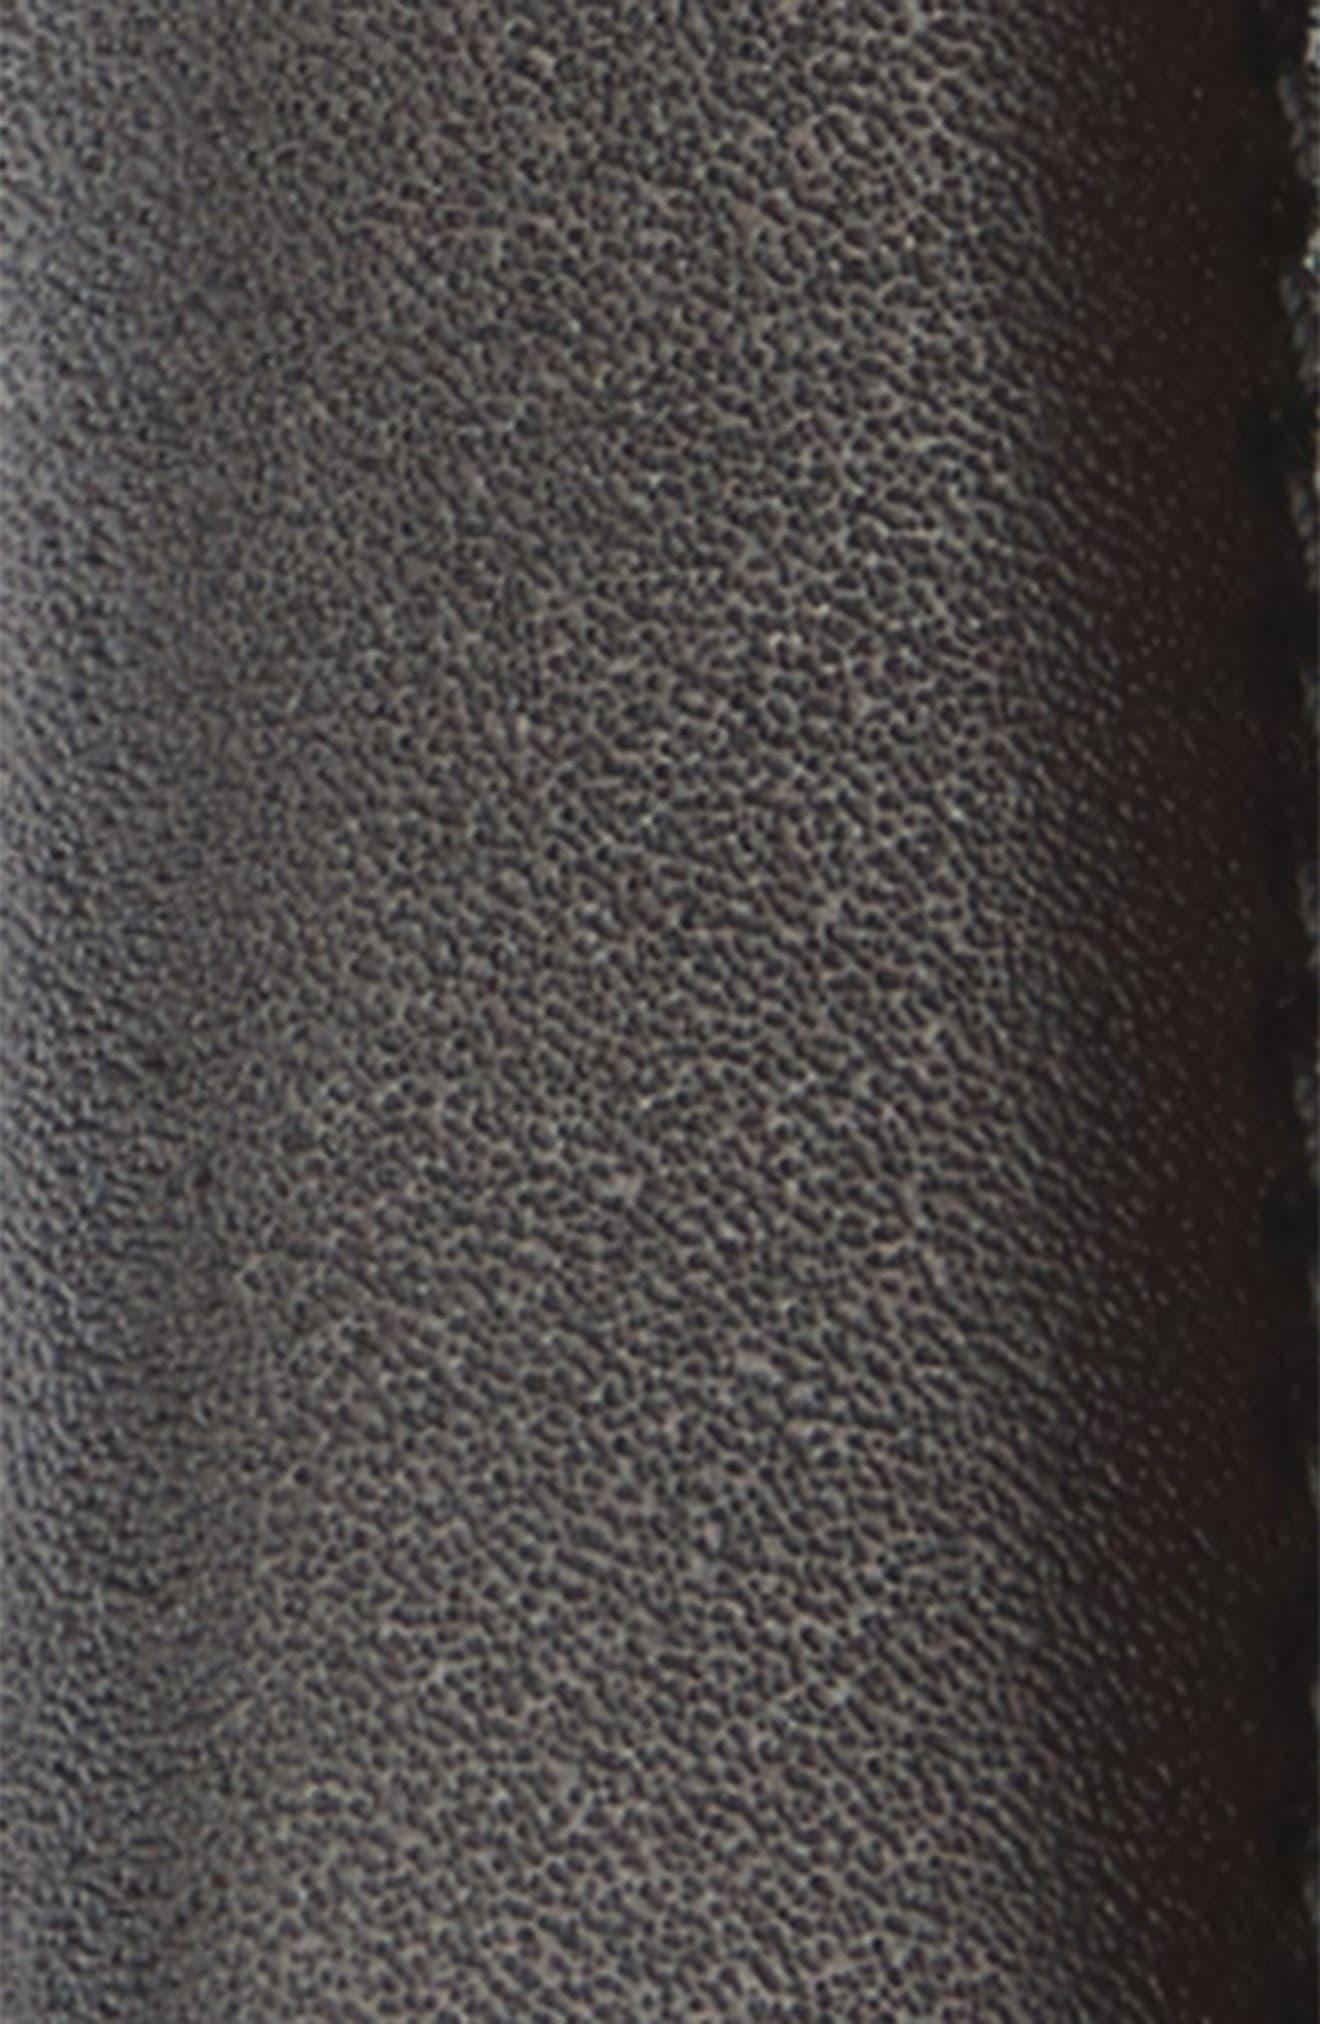 Reversible Leather Belt,                             Alternate thumbnail 3, color,                             001